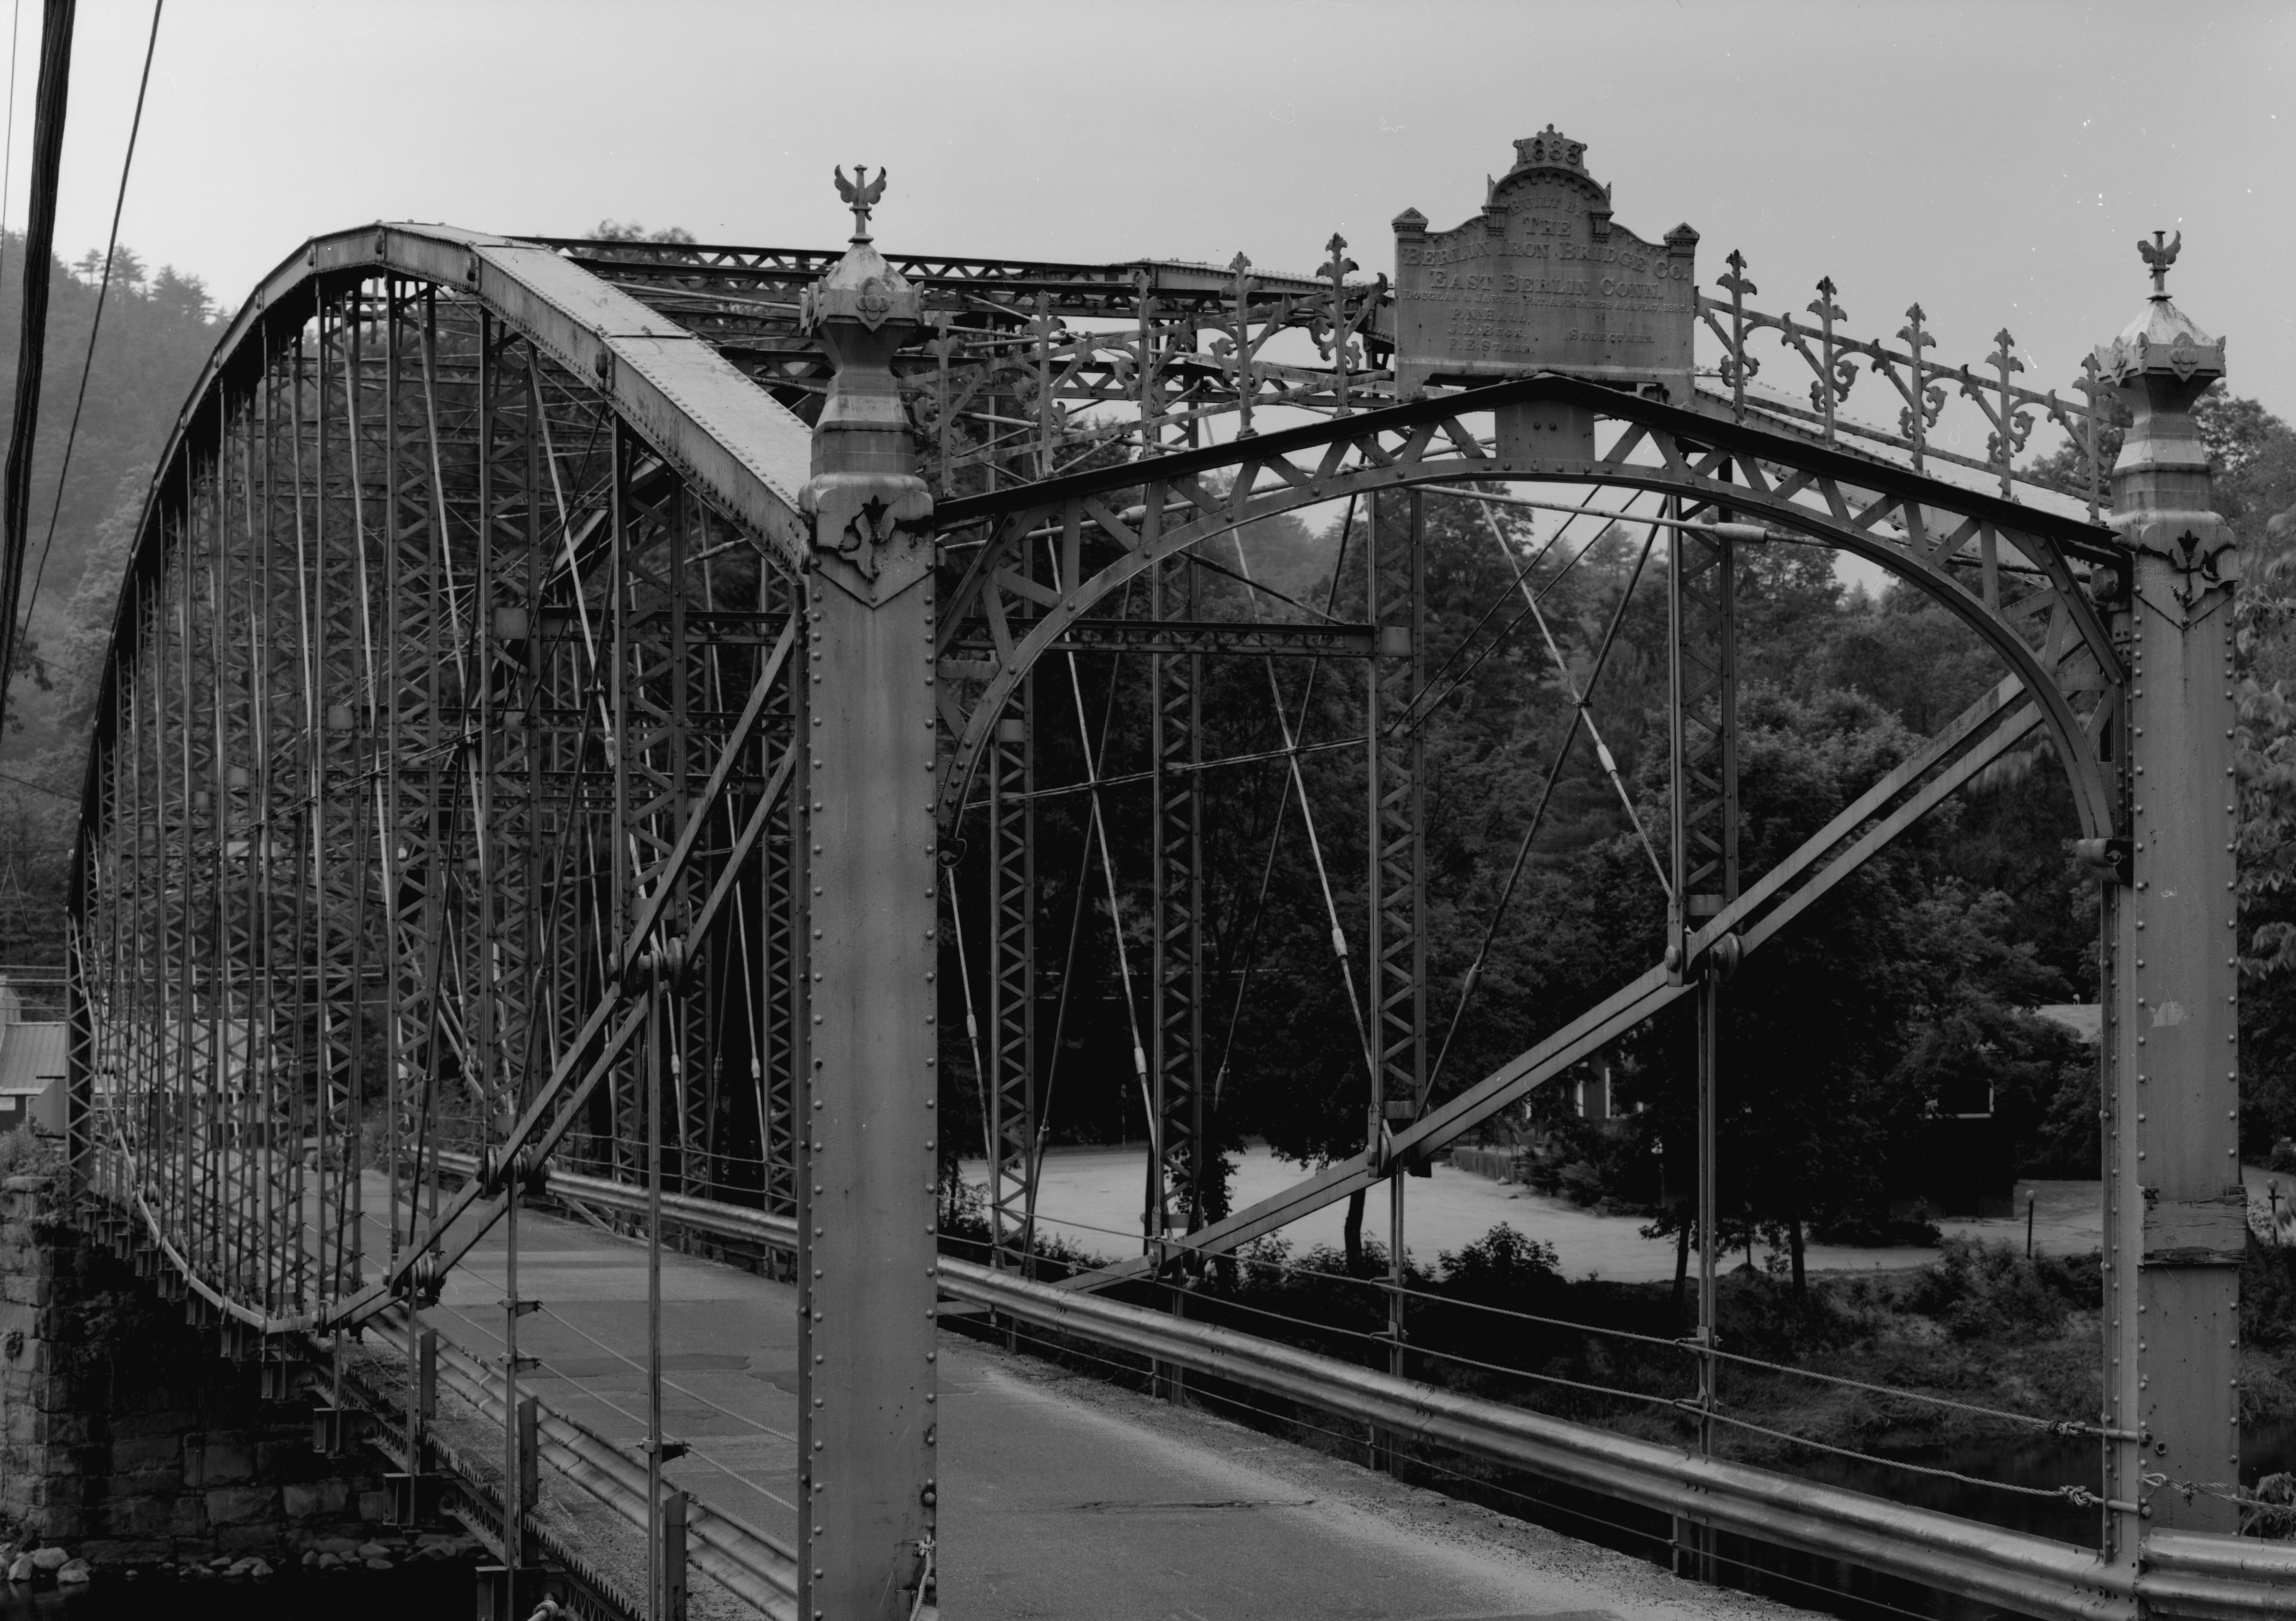 File:Boardman's Lenticular Bridge, Spanning Housatonic ...